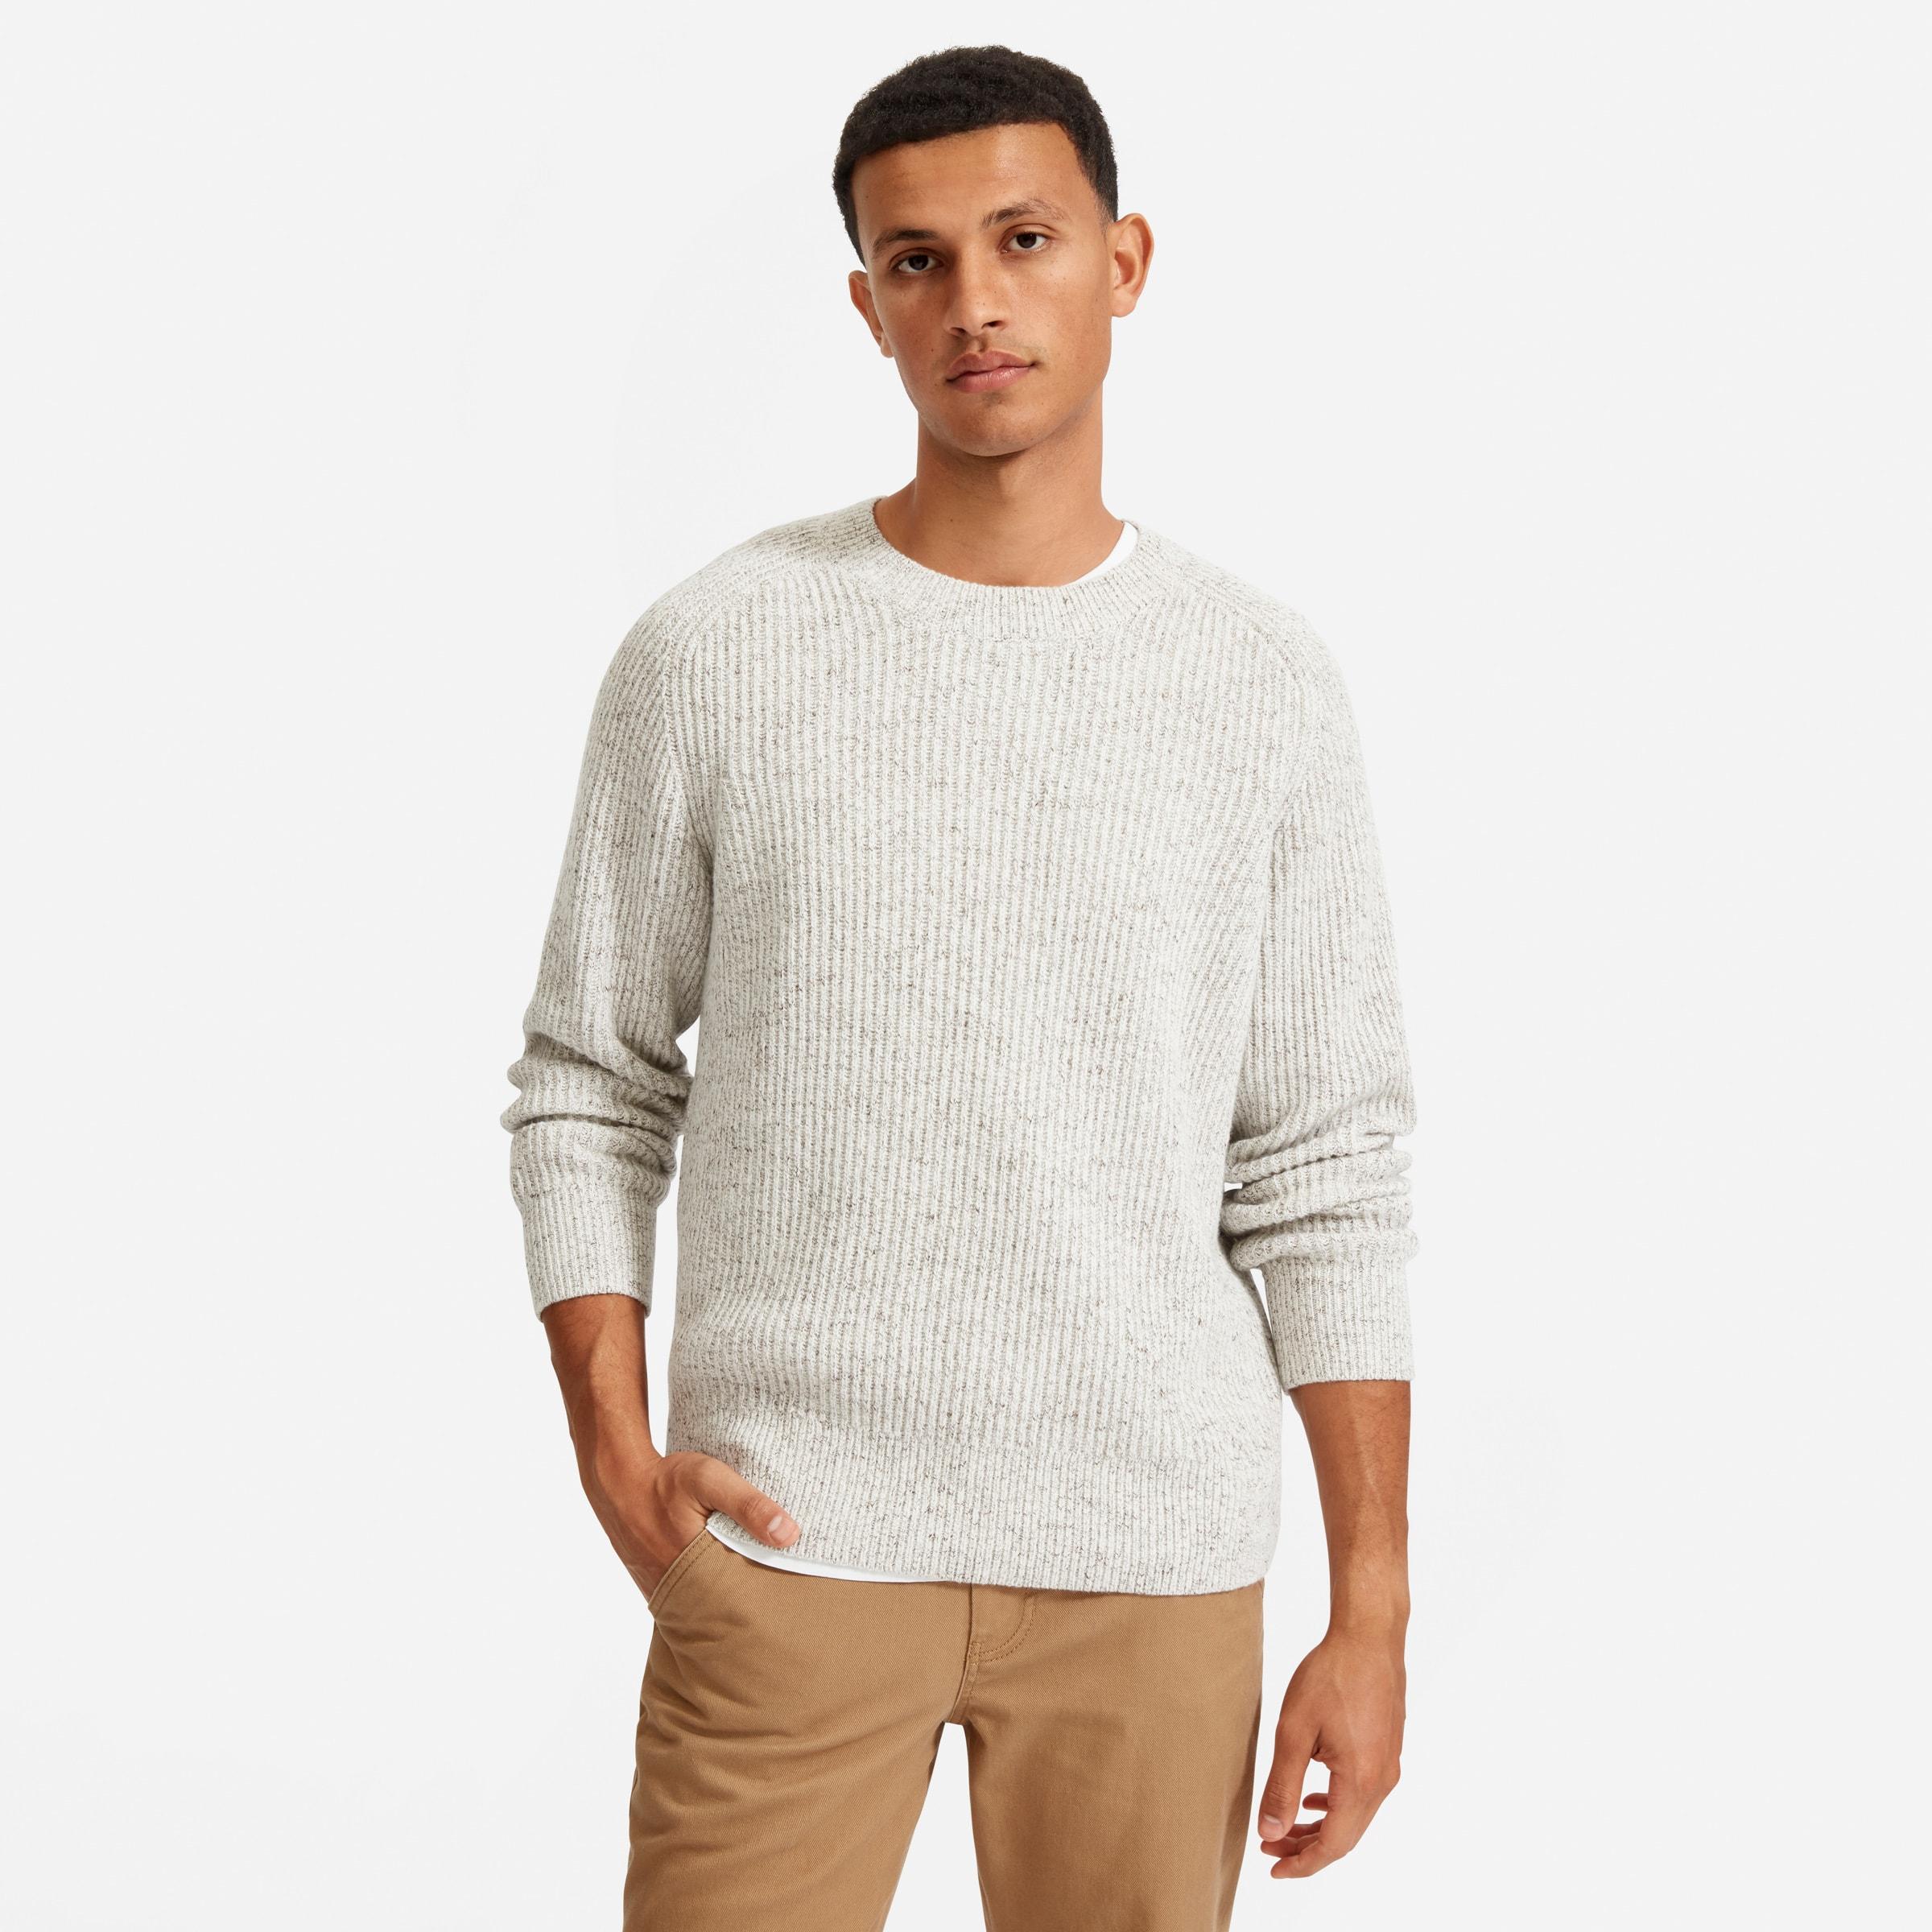 The Tri Twist Sweater Everlane